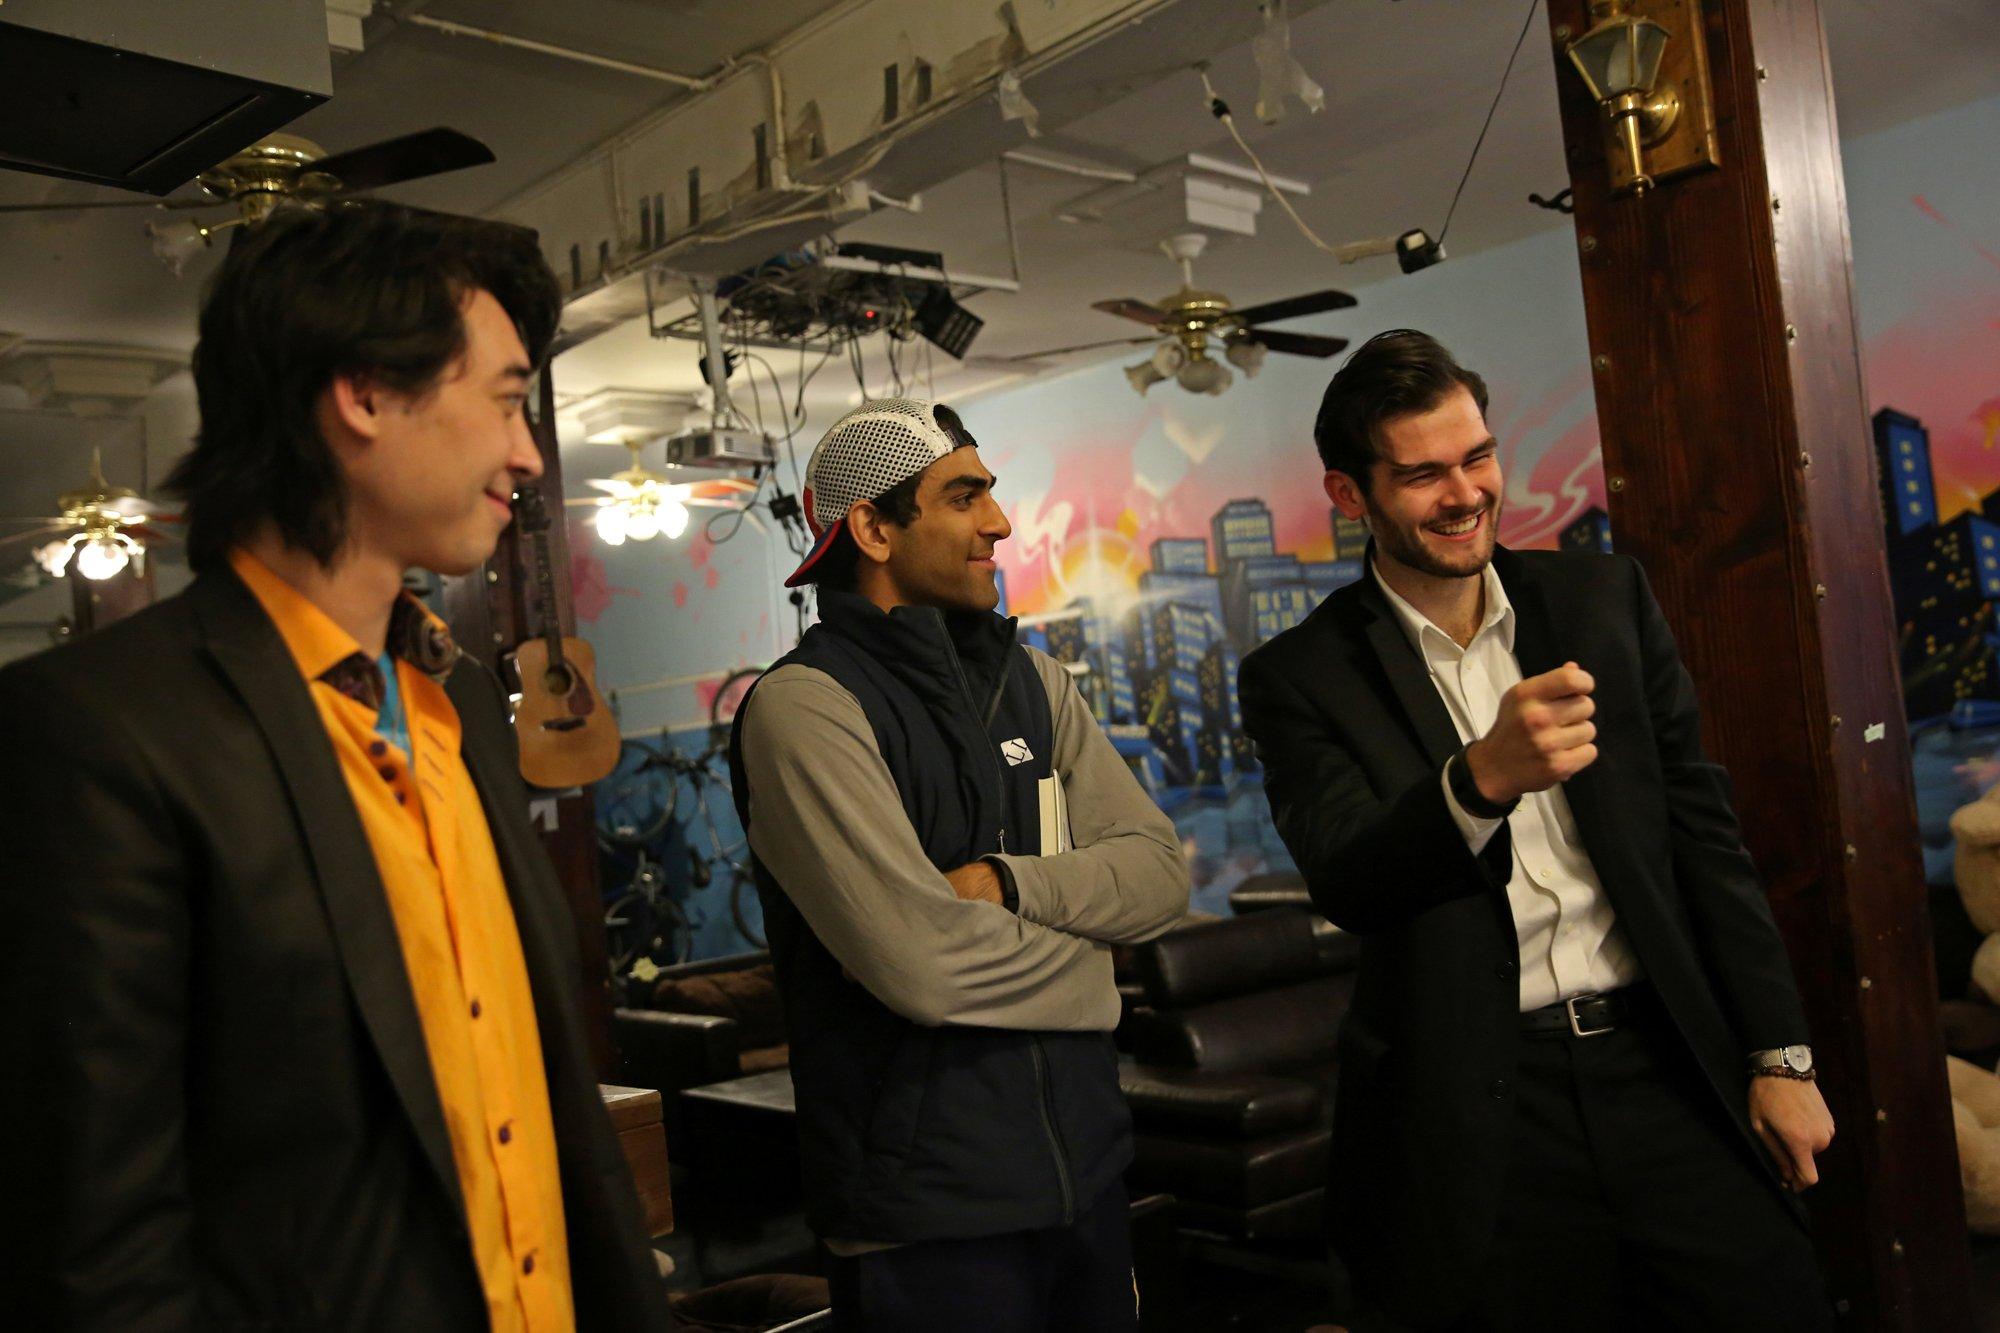 Social media marketing Companies in New York NYC Startups Fashion startups san francisco